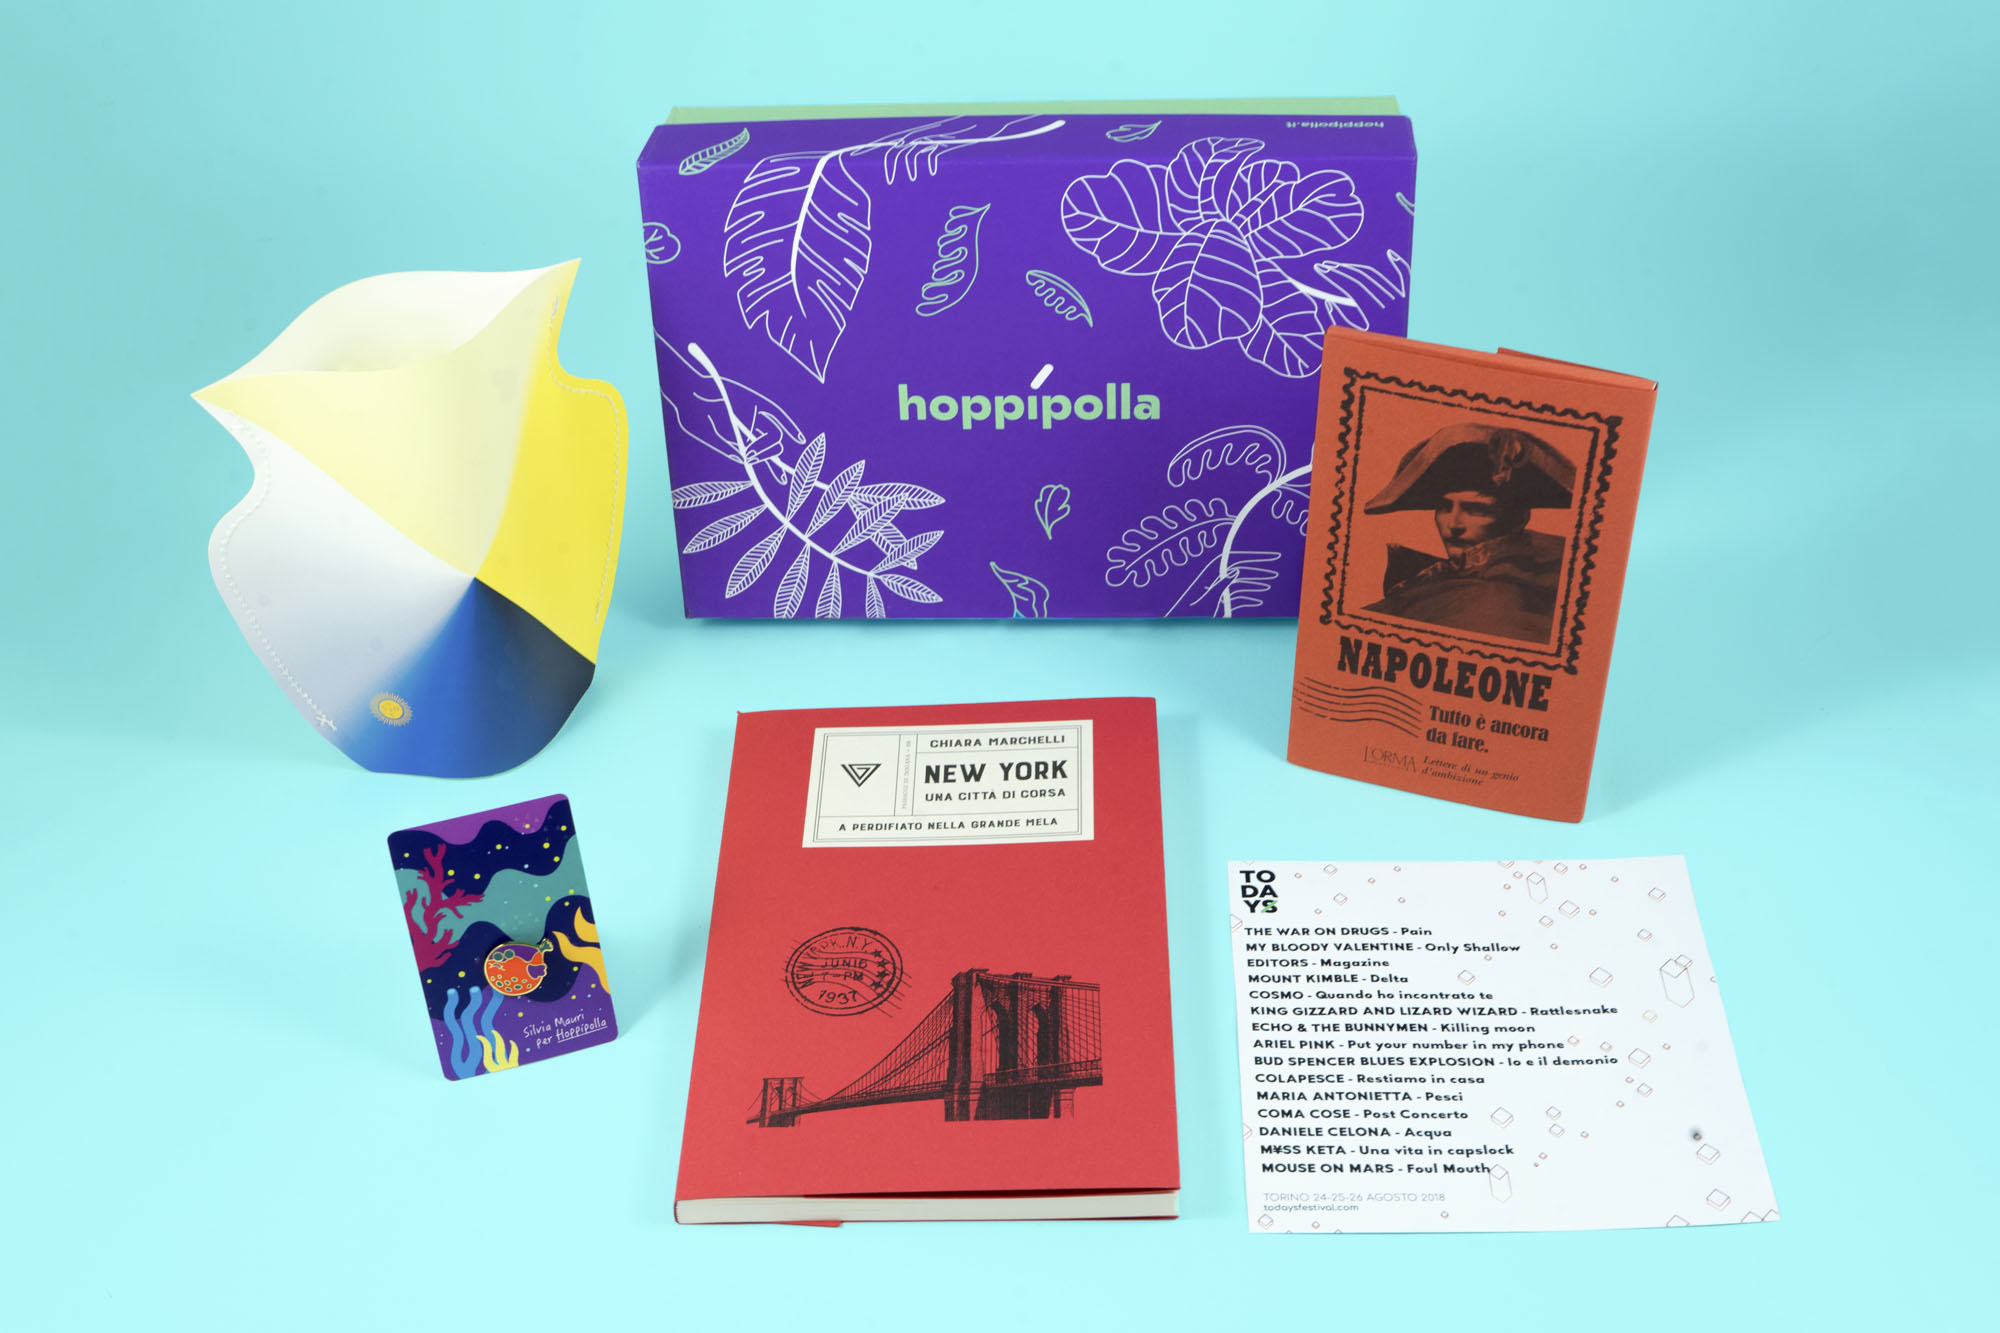 hoppipolla-19-box colomboni (5)